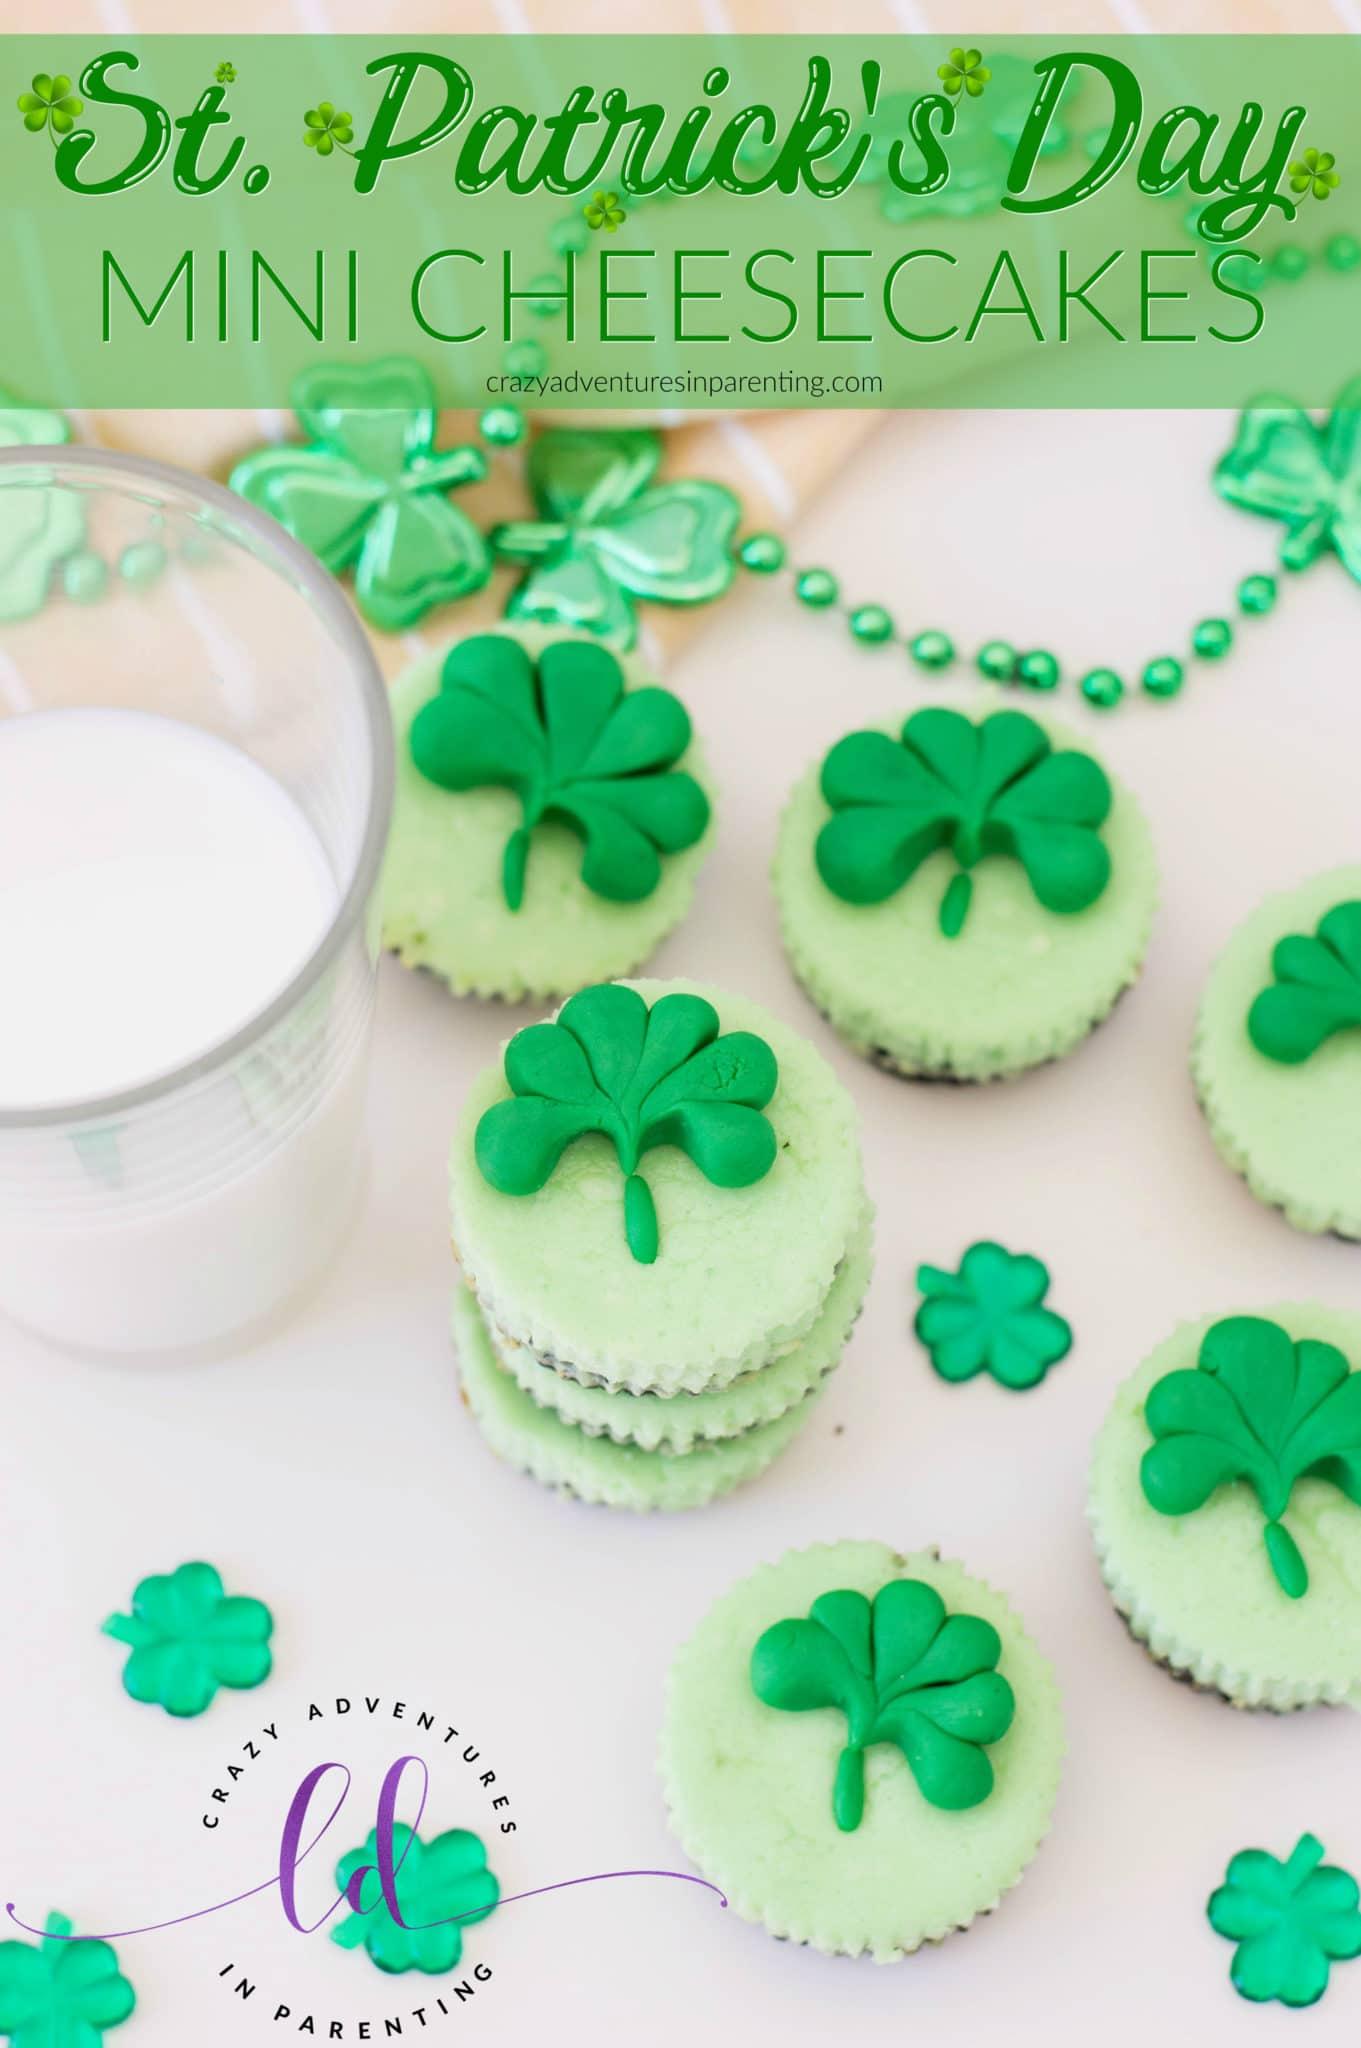 Shamrock St. Patrick's Day Mini Cheesecakes Recipe